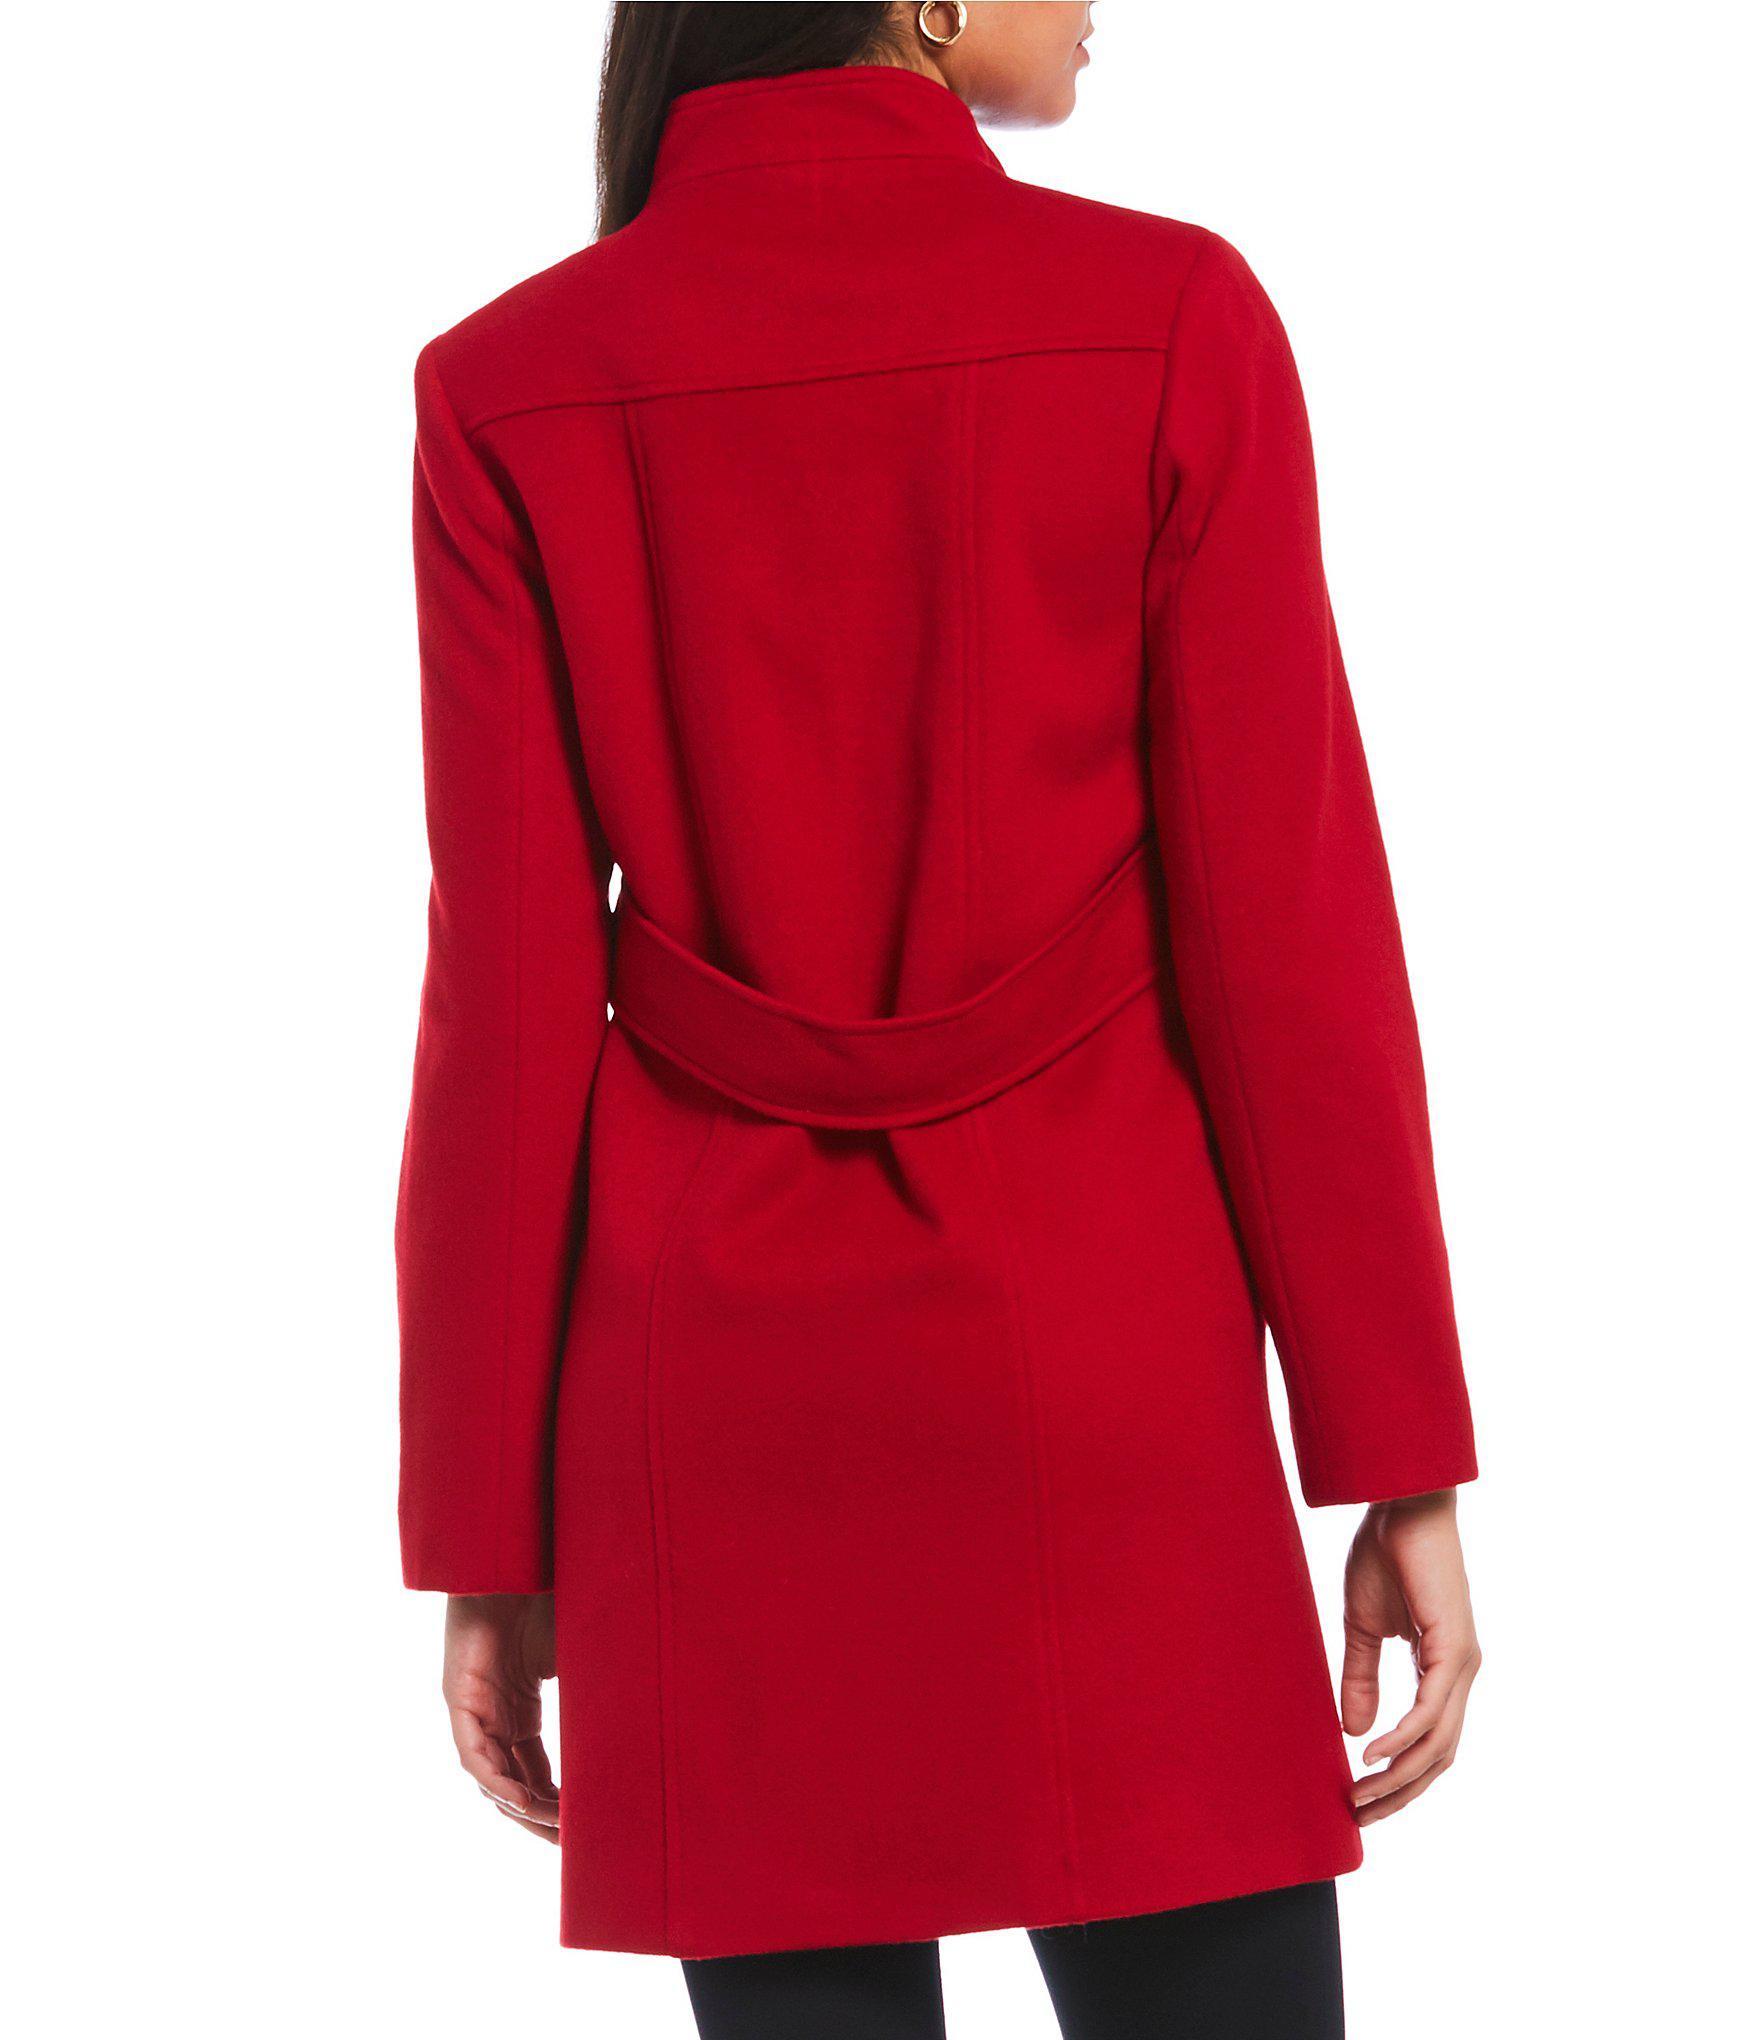 2416f9415c8f Katherine kelly classic stand collar single breasted wool coat jpg  1760x2040 Dillards katherine kelly coats